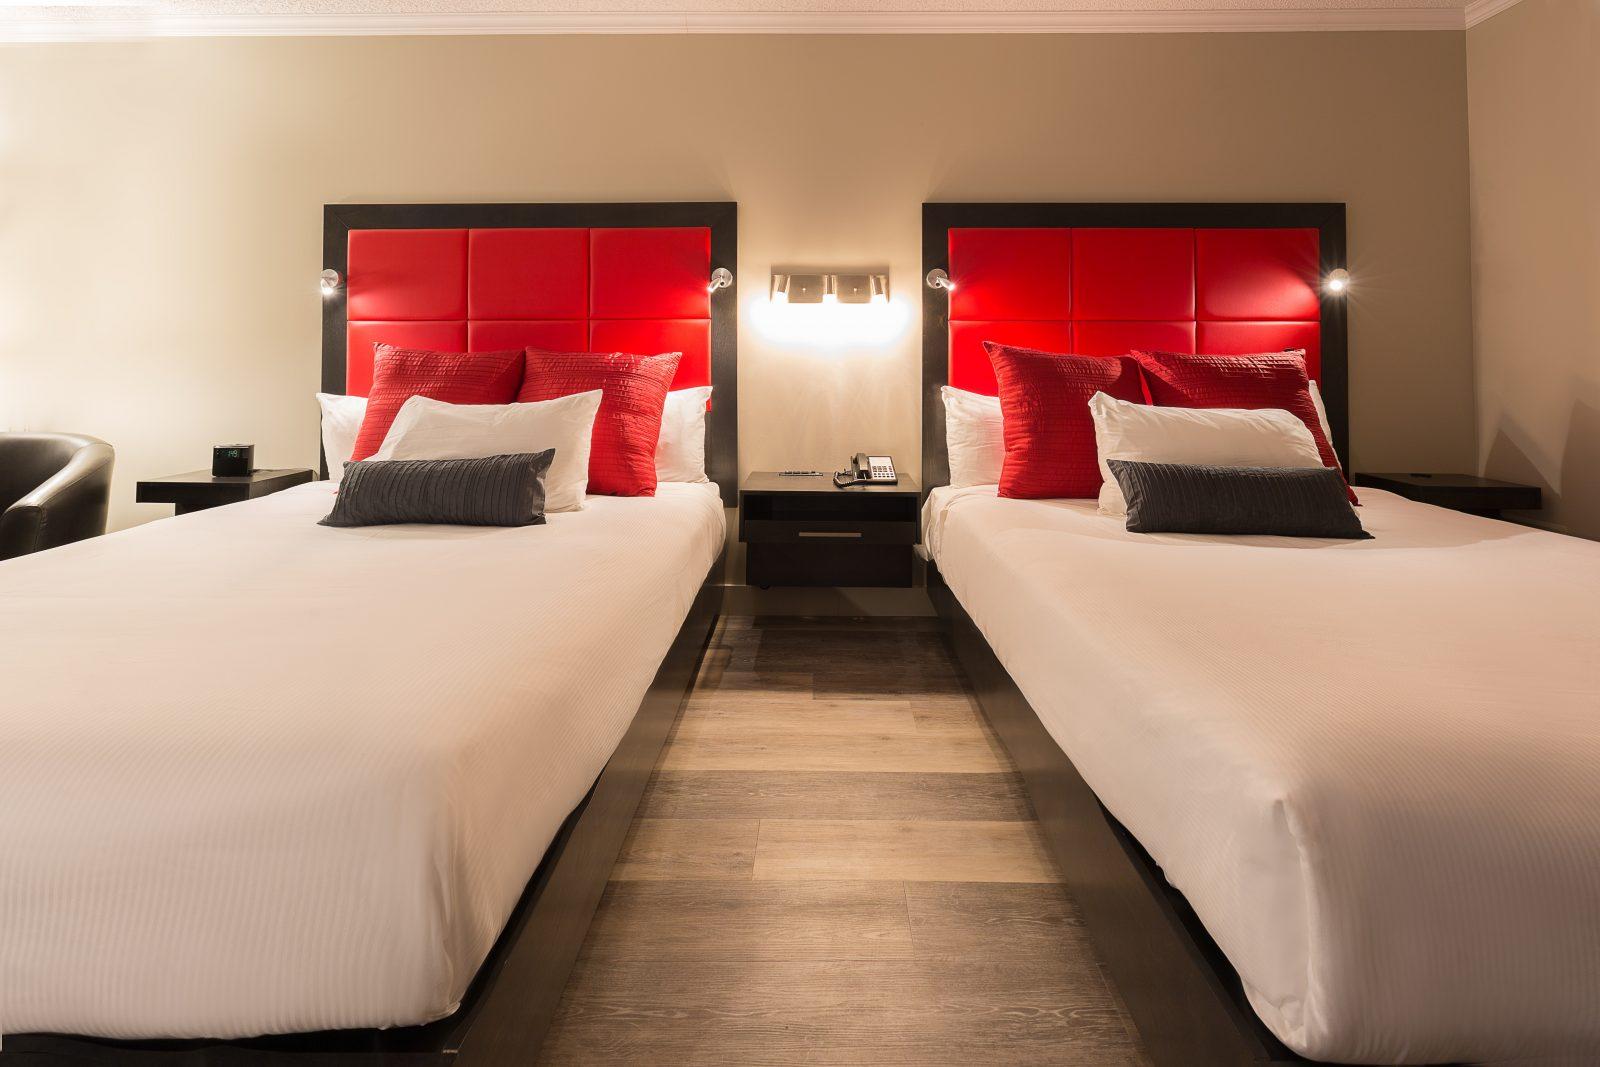 https://www.hoteluniversel.com/wp-content/uploads/2014/09/2Q7A3310-1600x1067.jpg